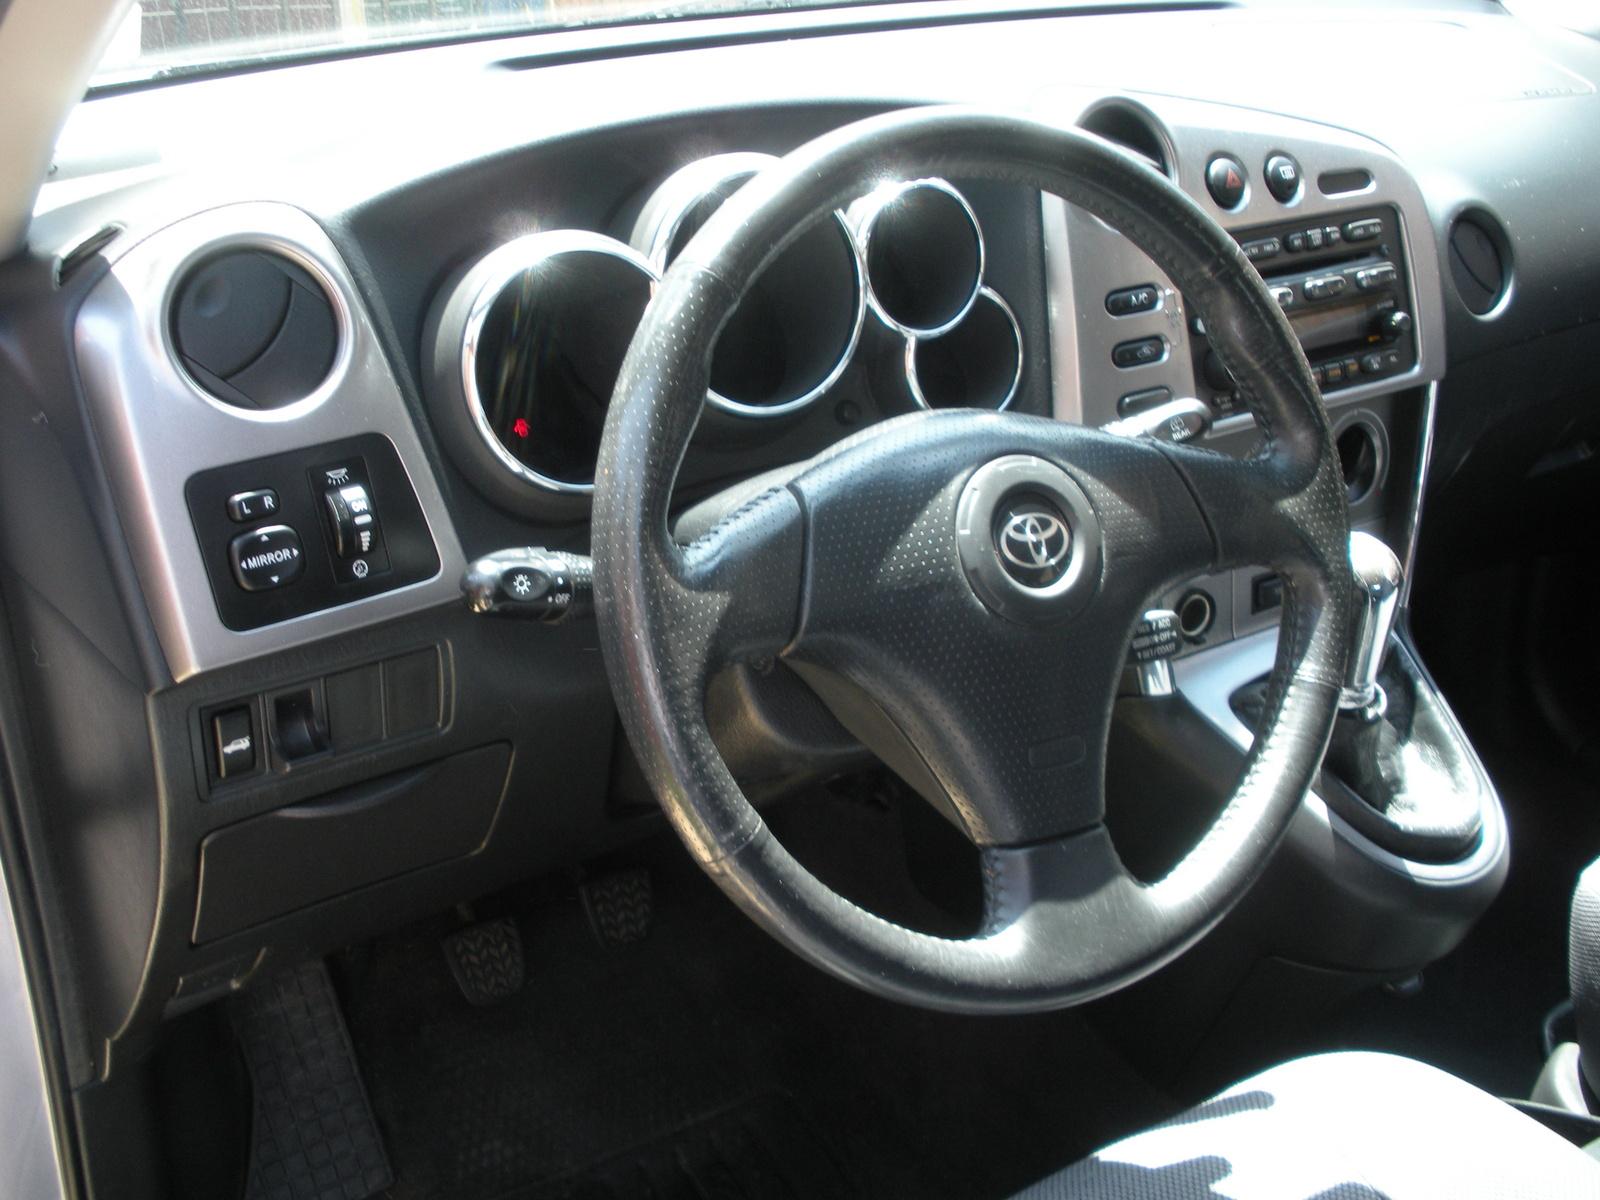 2004 Toyota Matrix #3 Toyota Matrix #3